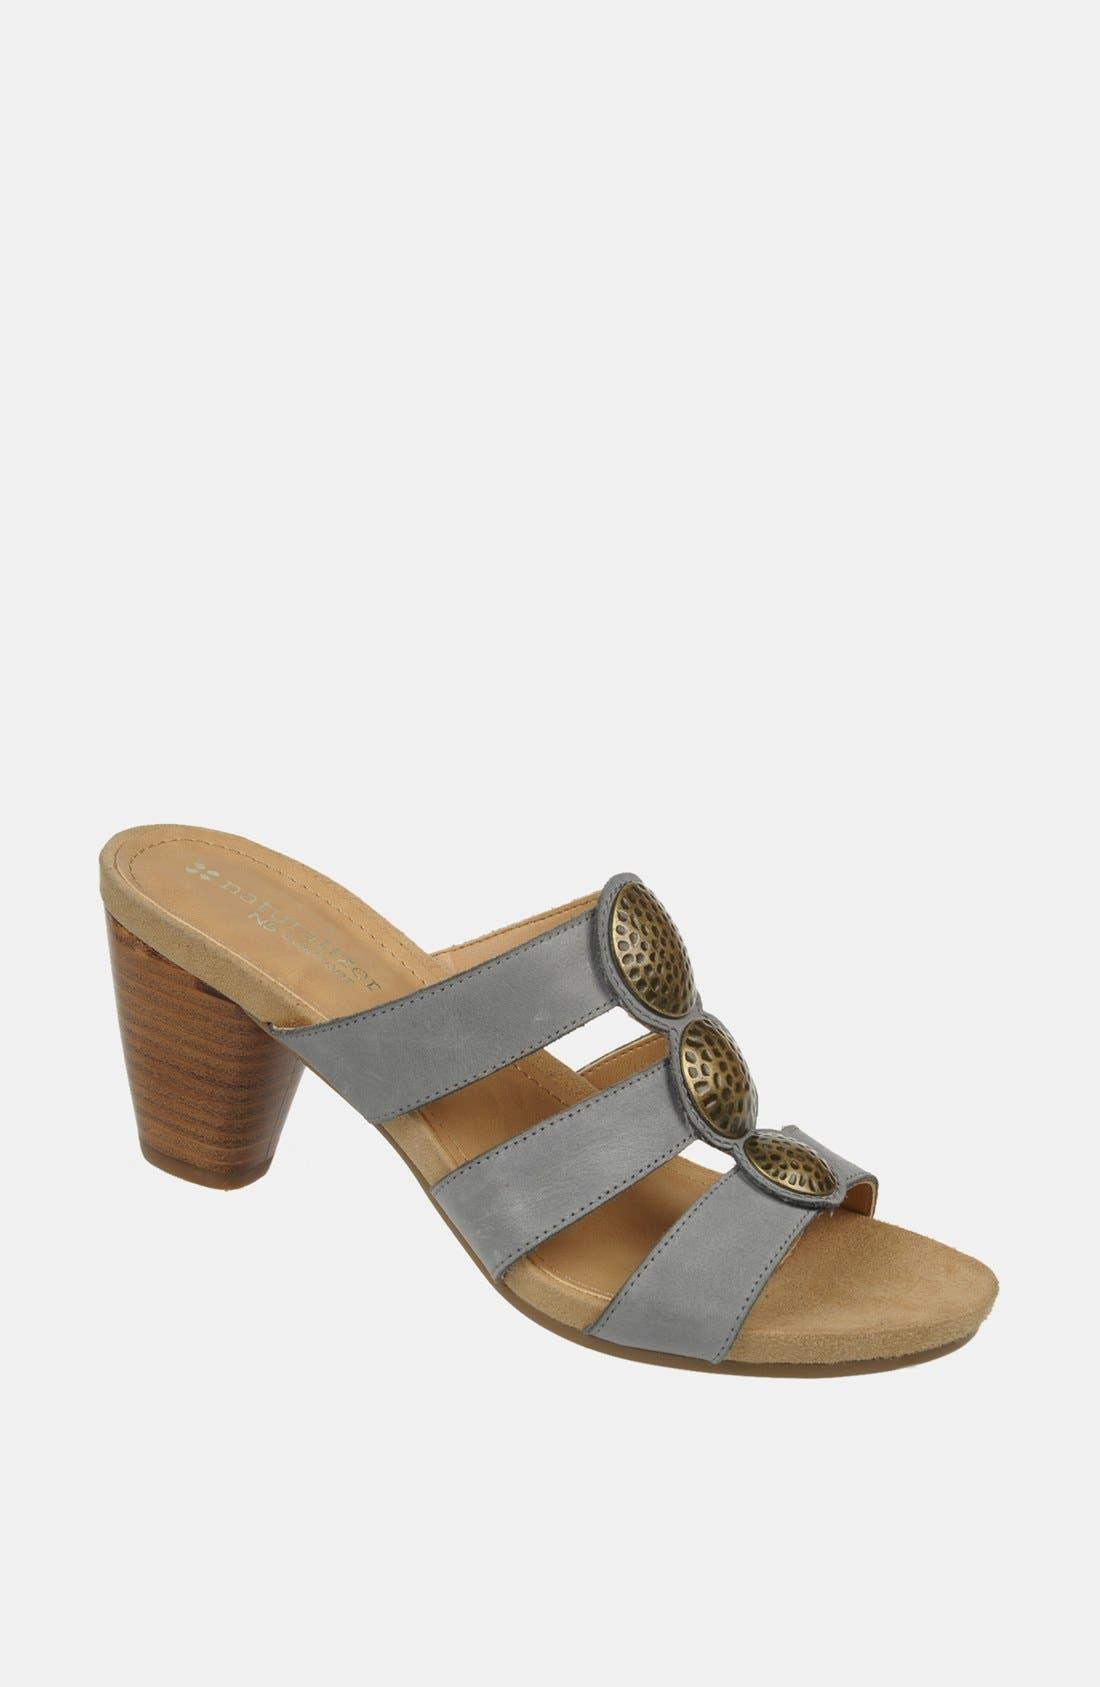 Alternate Image 1 Selected - Naturalizer 'Egypt' Sandal